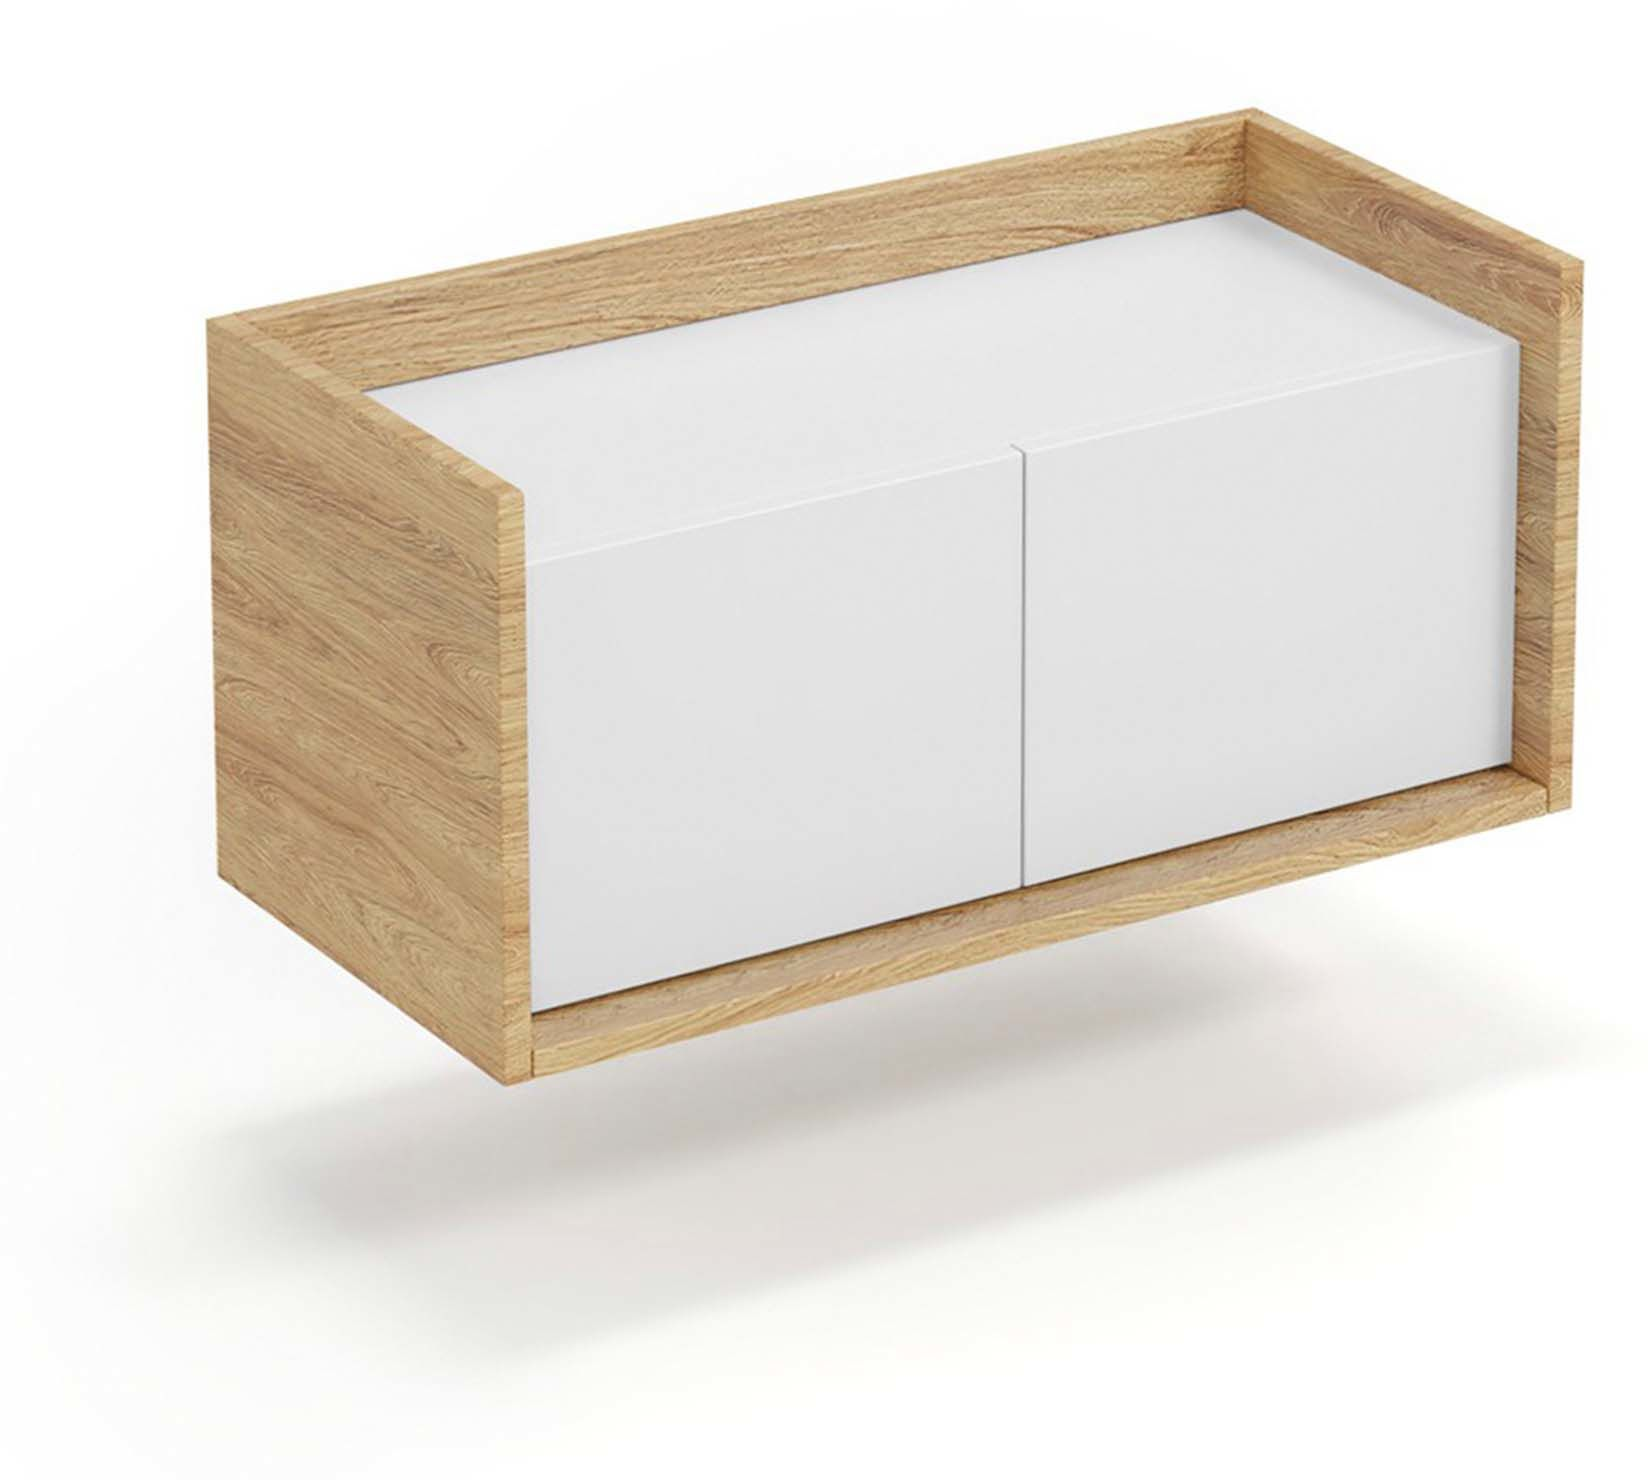 Mobius szafka niska 2D (78x41x36 cm), róż, meble modułowe